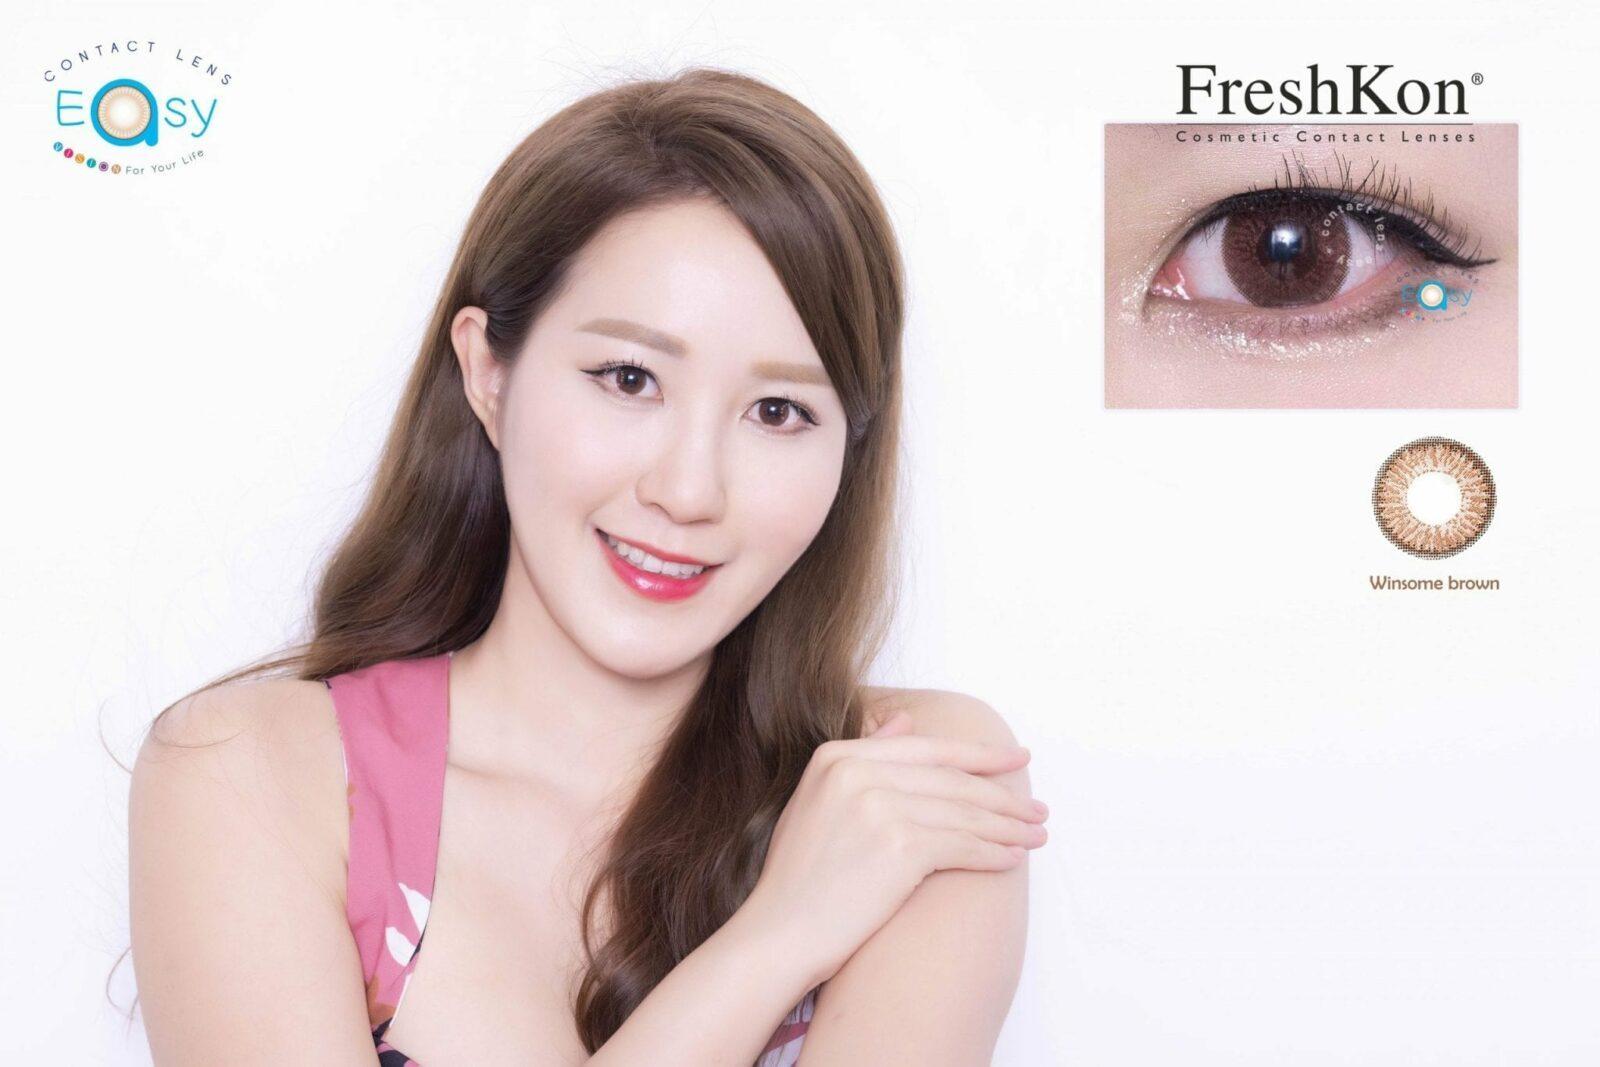 Freshkon Alluring Eyes 大美目 1 Day - Winsome Brown (原盒環保裝)_info